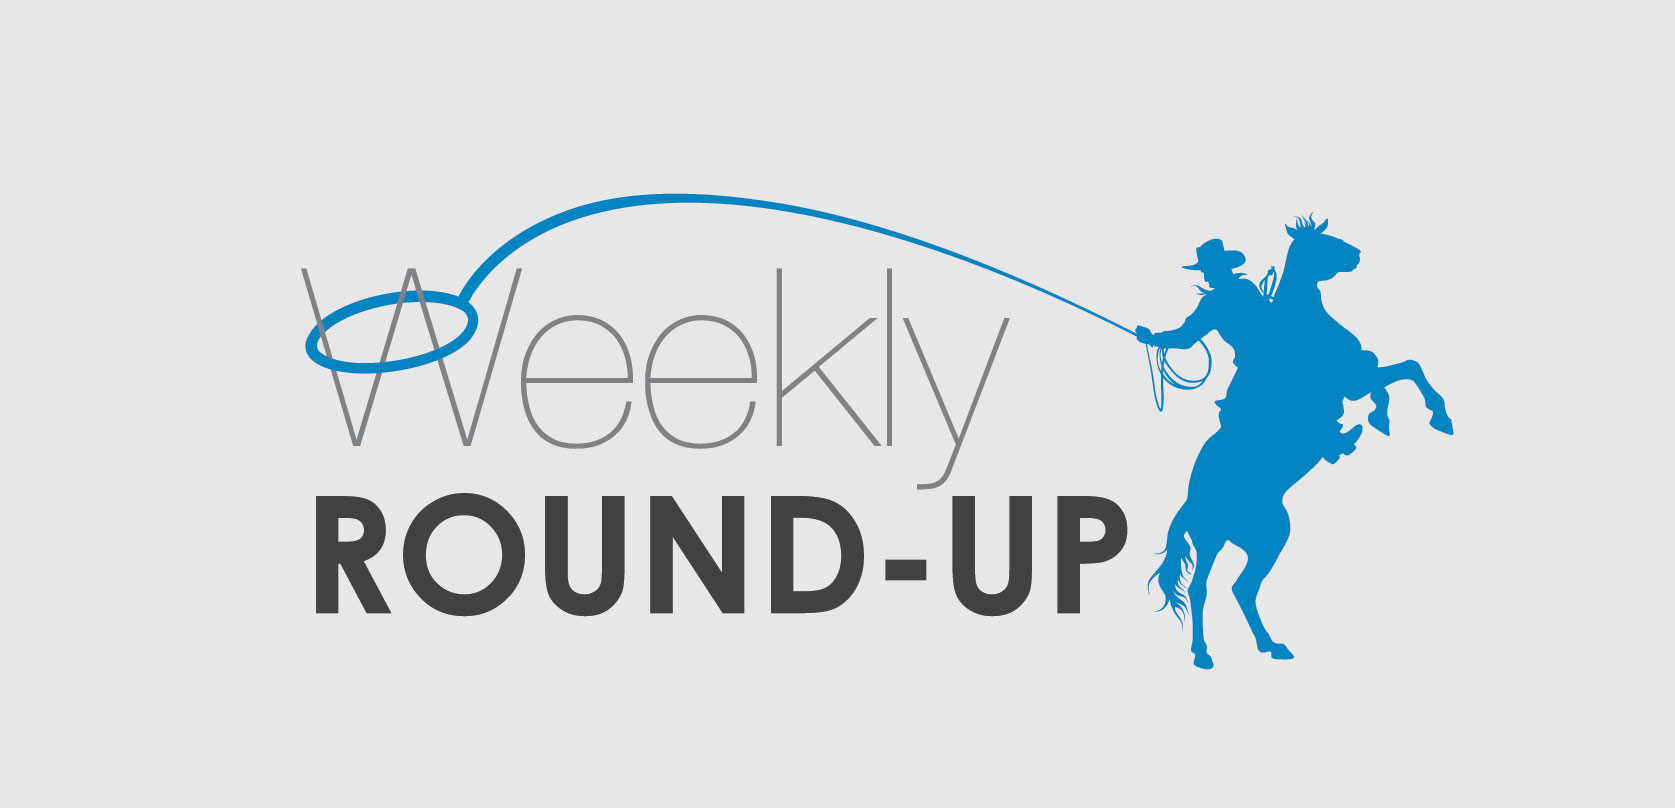 weekly round-up, best of blogs, best leadership blogs, employee communication, top blog posts, best blogs of the week